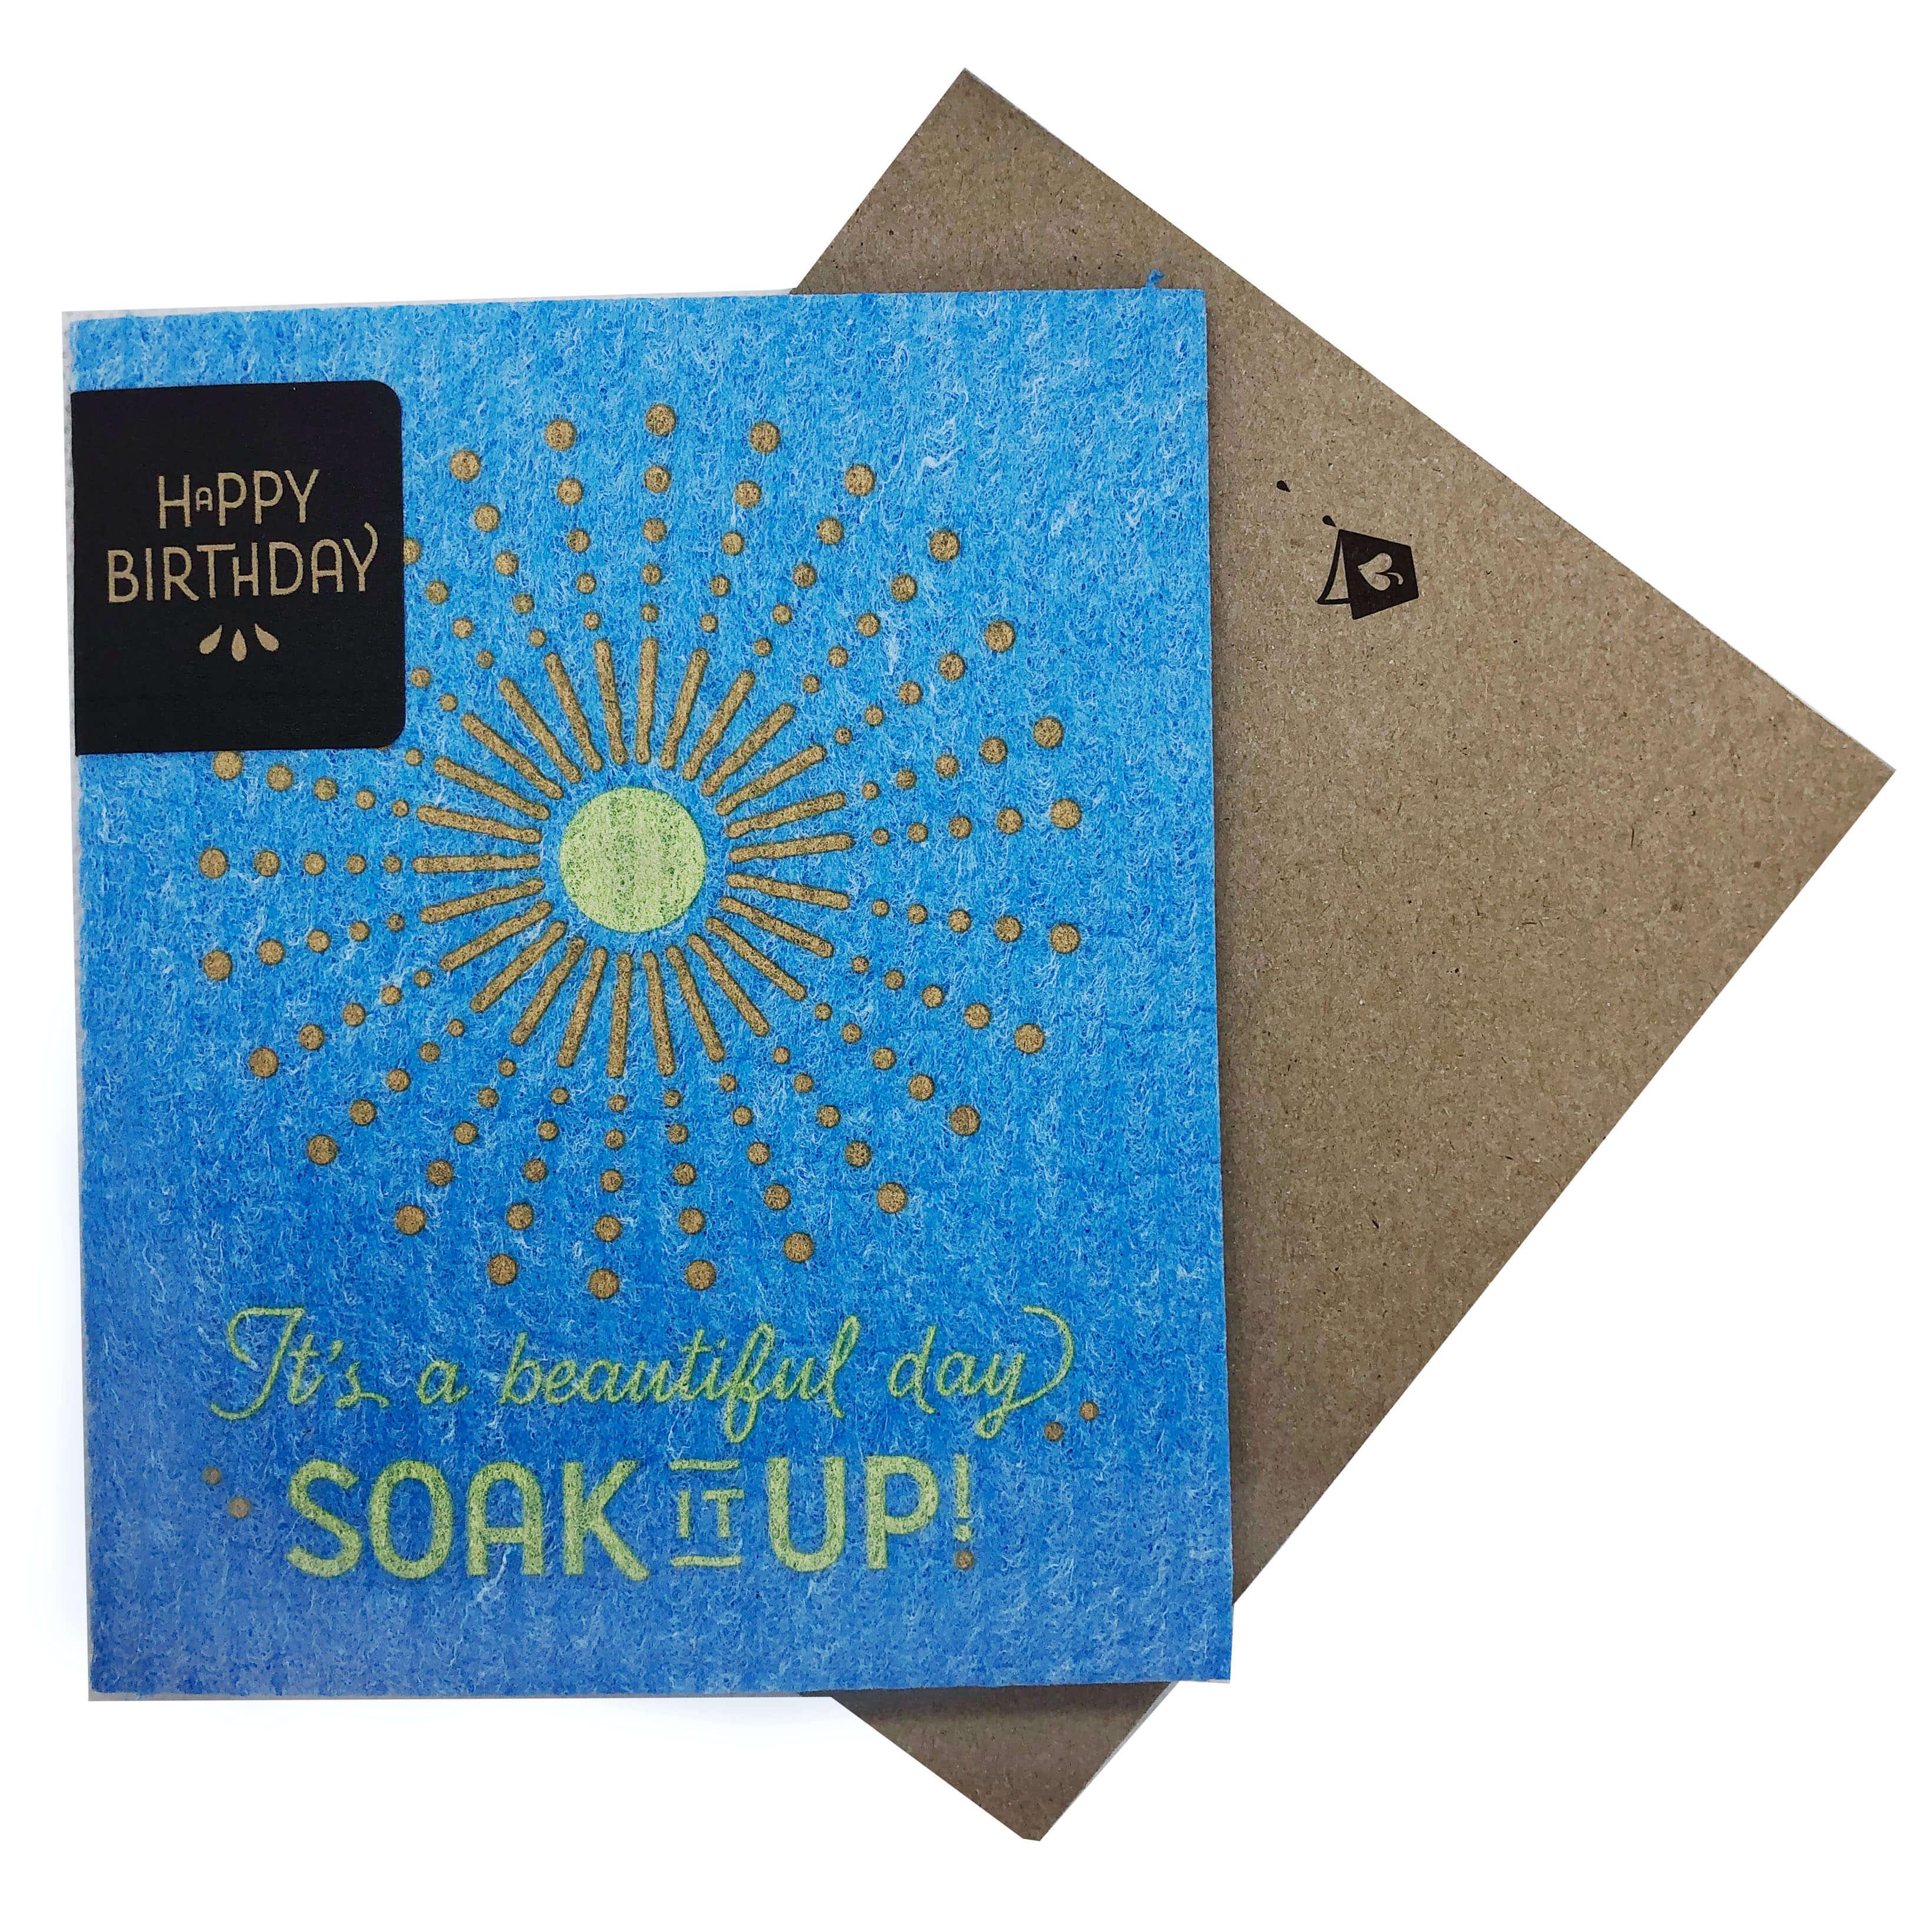 Greeting Card - It's a Beautiful Day—Soak iT Up